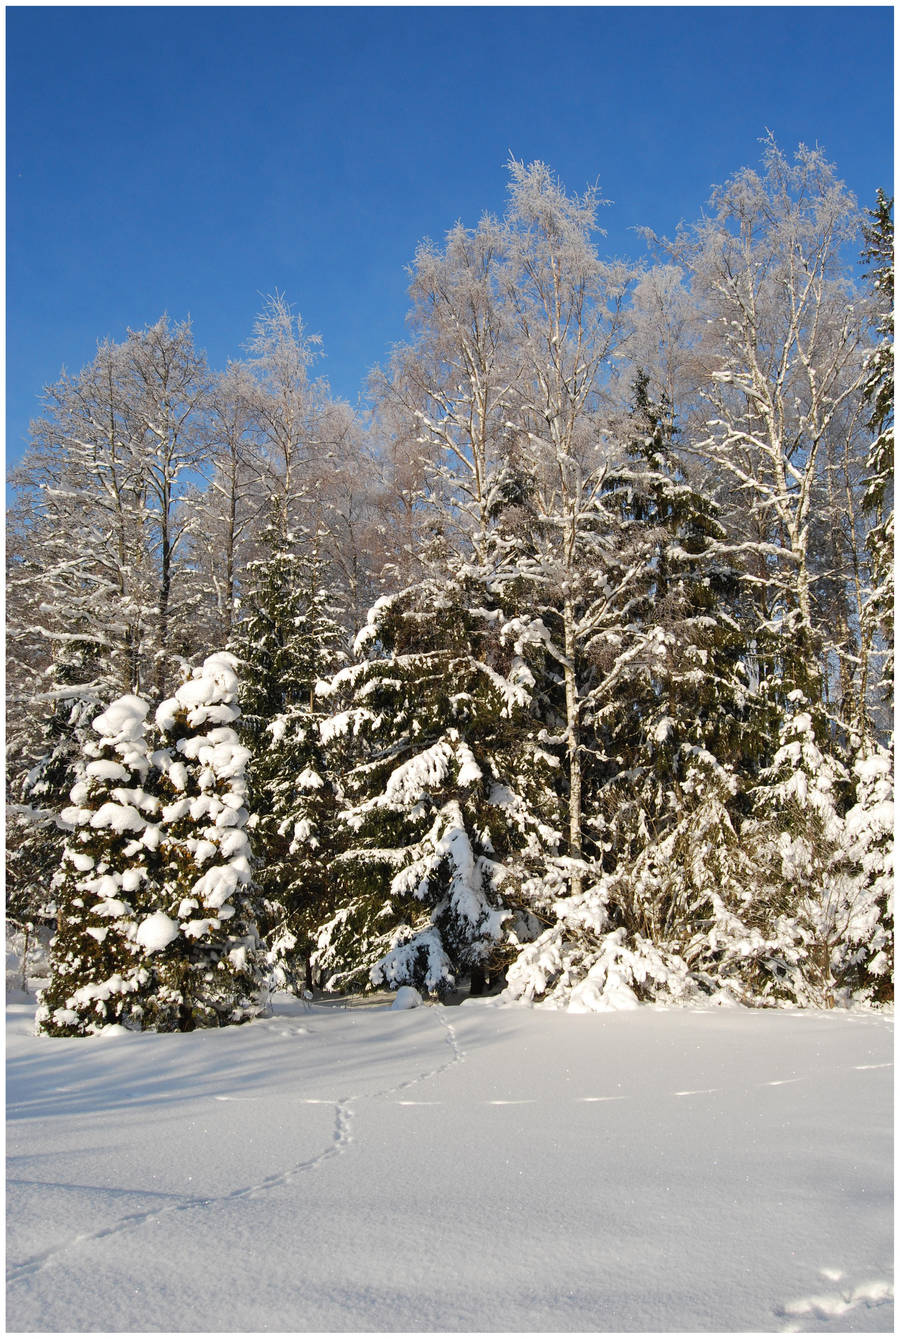 BG World Of Snow XIV by Eirian-stock